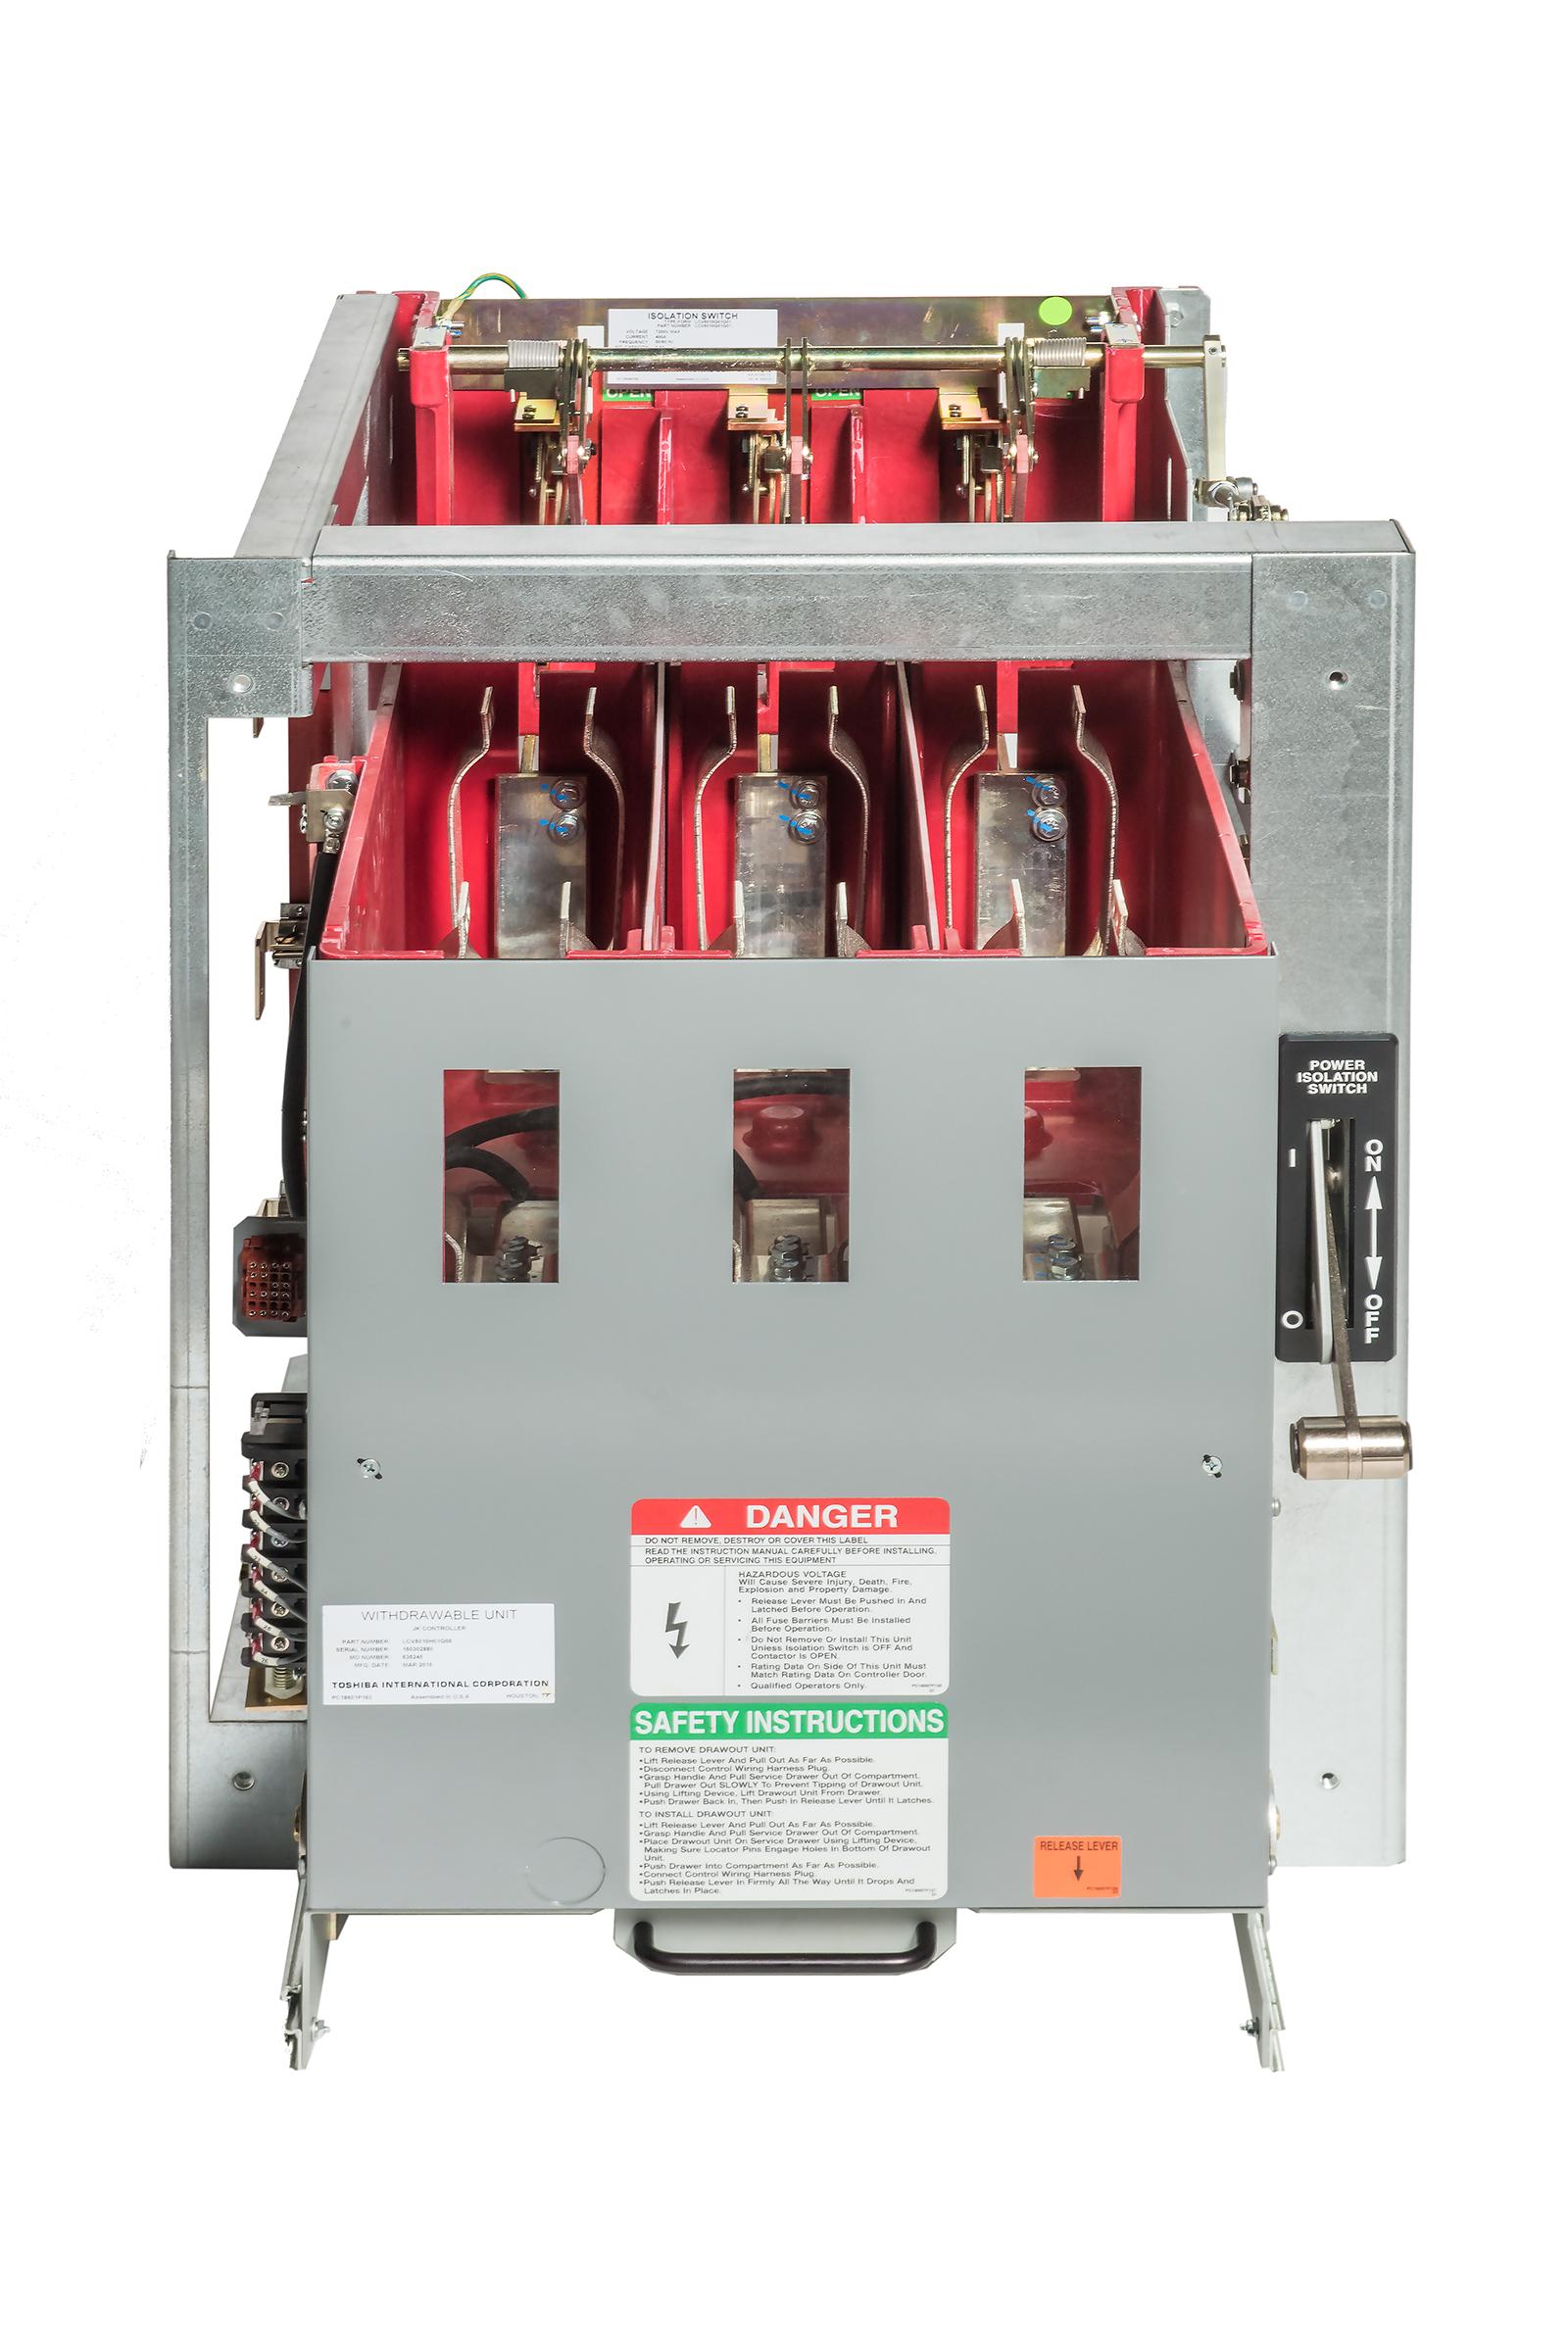 Medium Voltage Jk Oem Motors Drives Toshiba International Power Connector Wiring Diagram Product Image Gallery